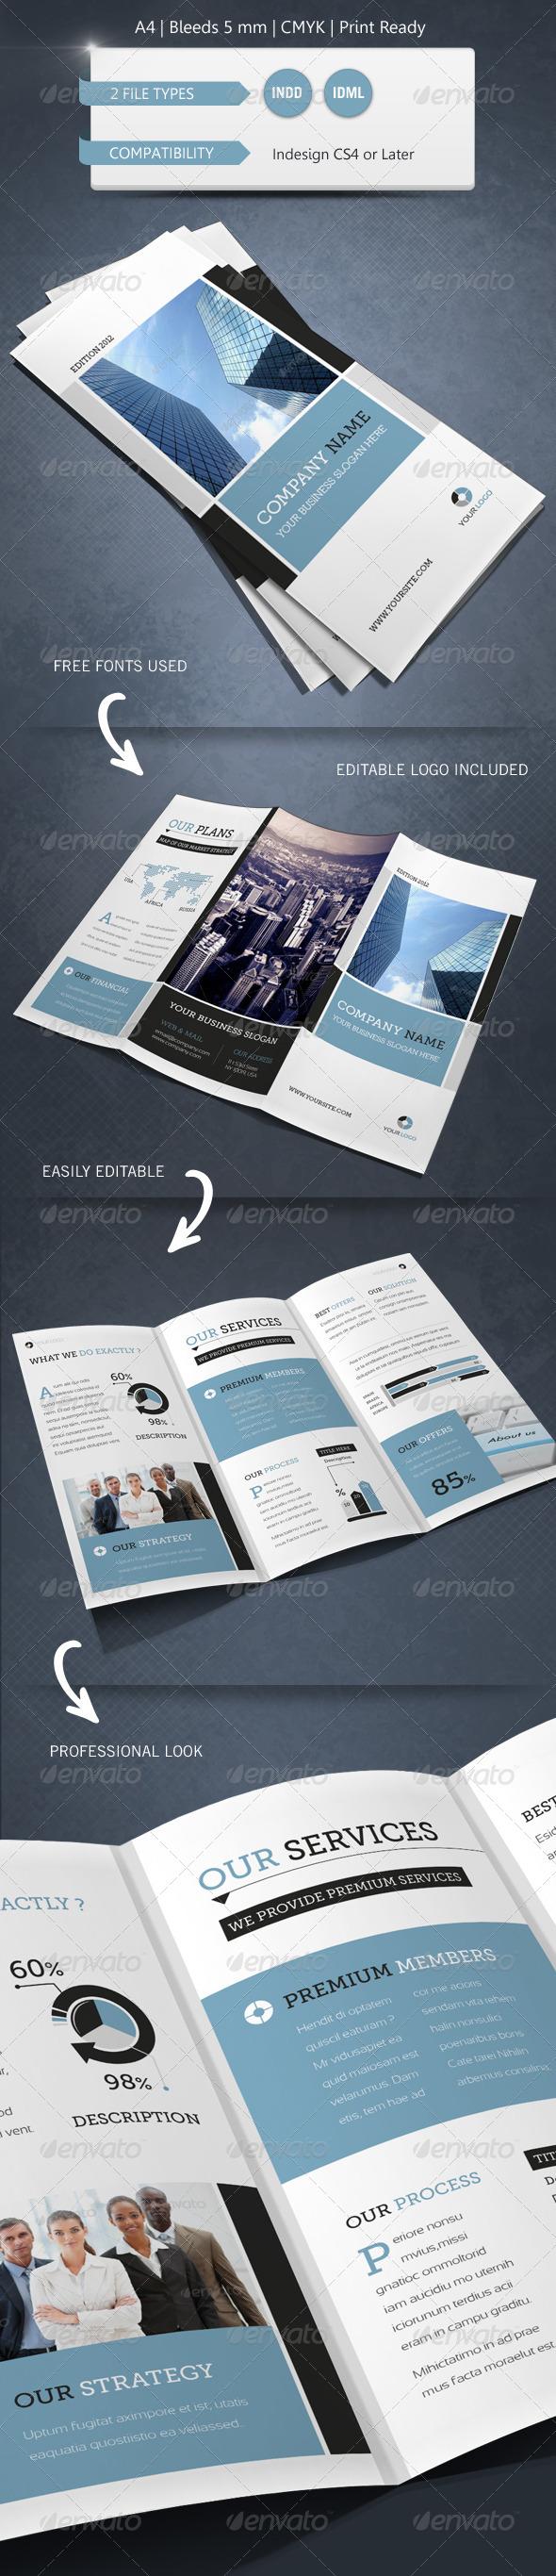 Modern & Corporate Trifold Brochure Template